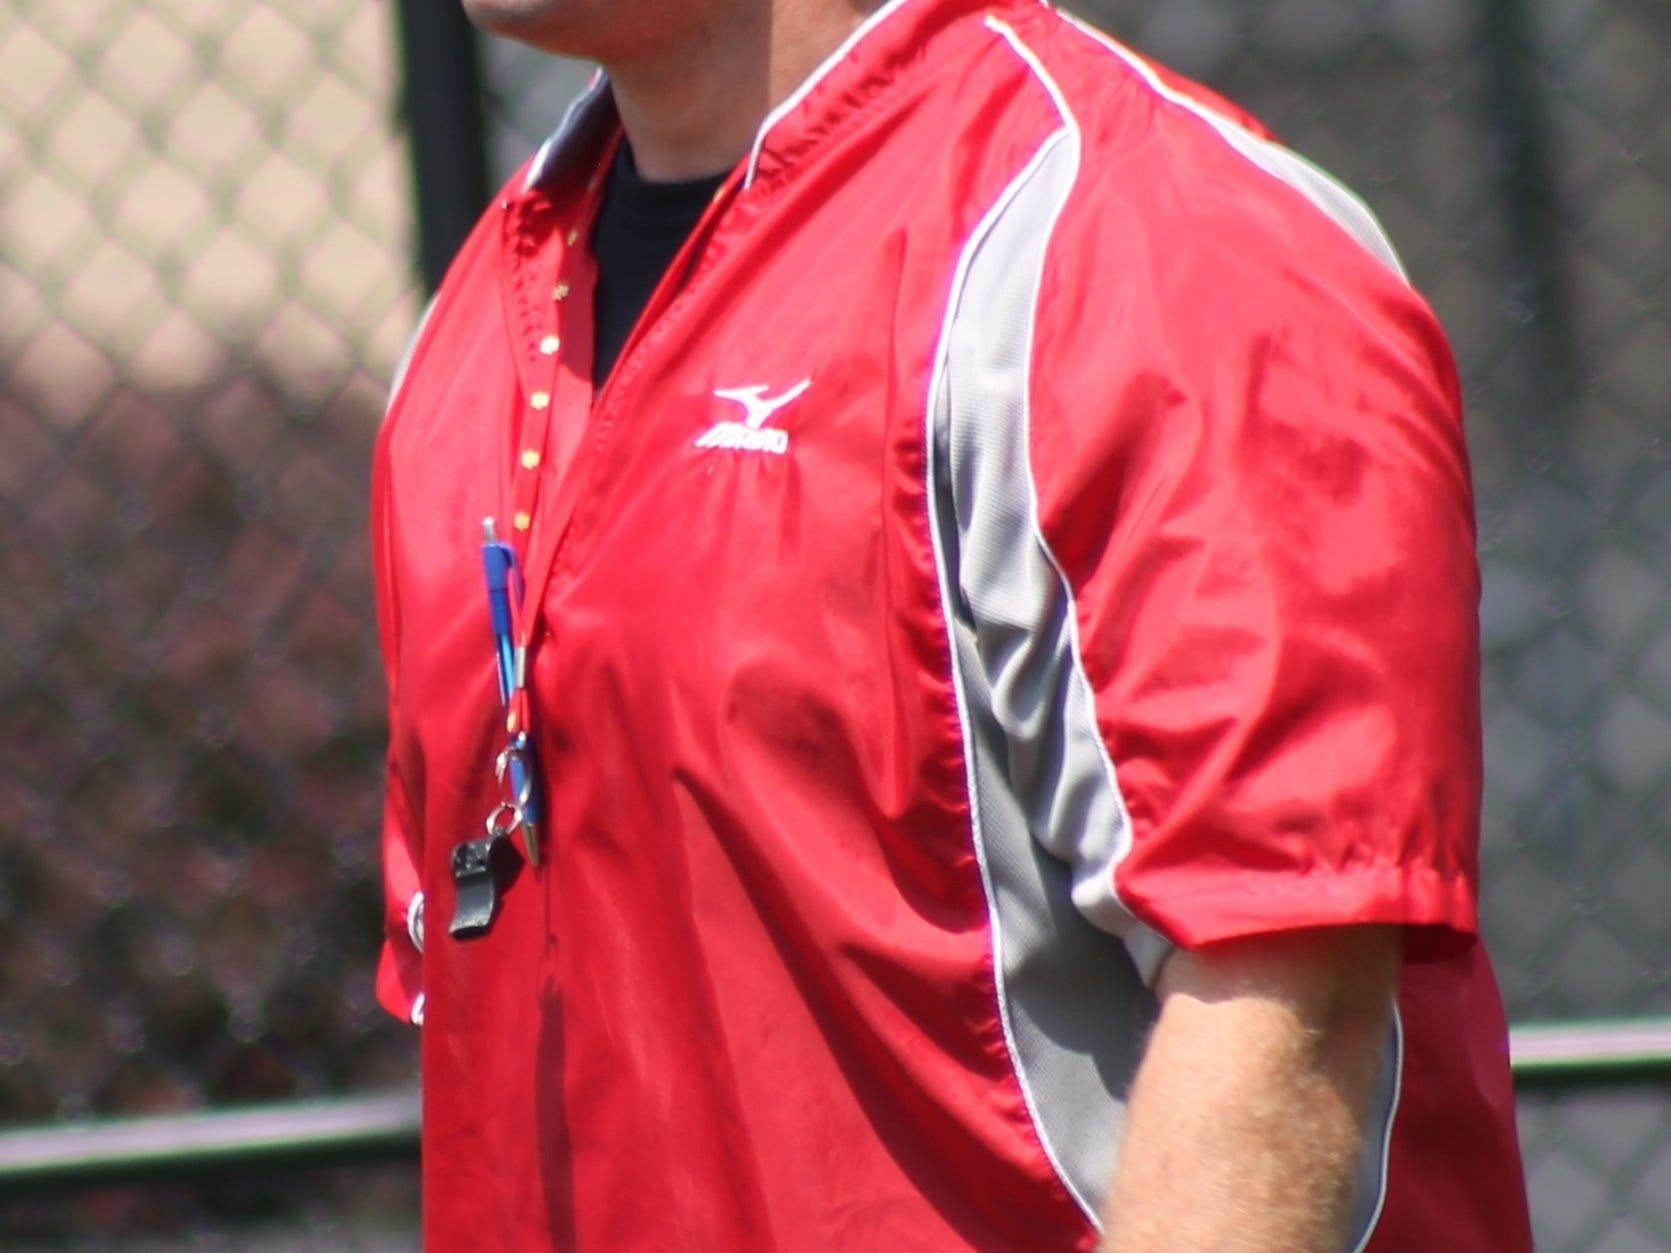 Former Cincinnati Bearcat Jon Tobin is the head coach of the Purcell Marian Cavaliers.